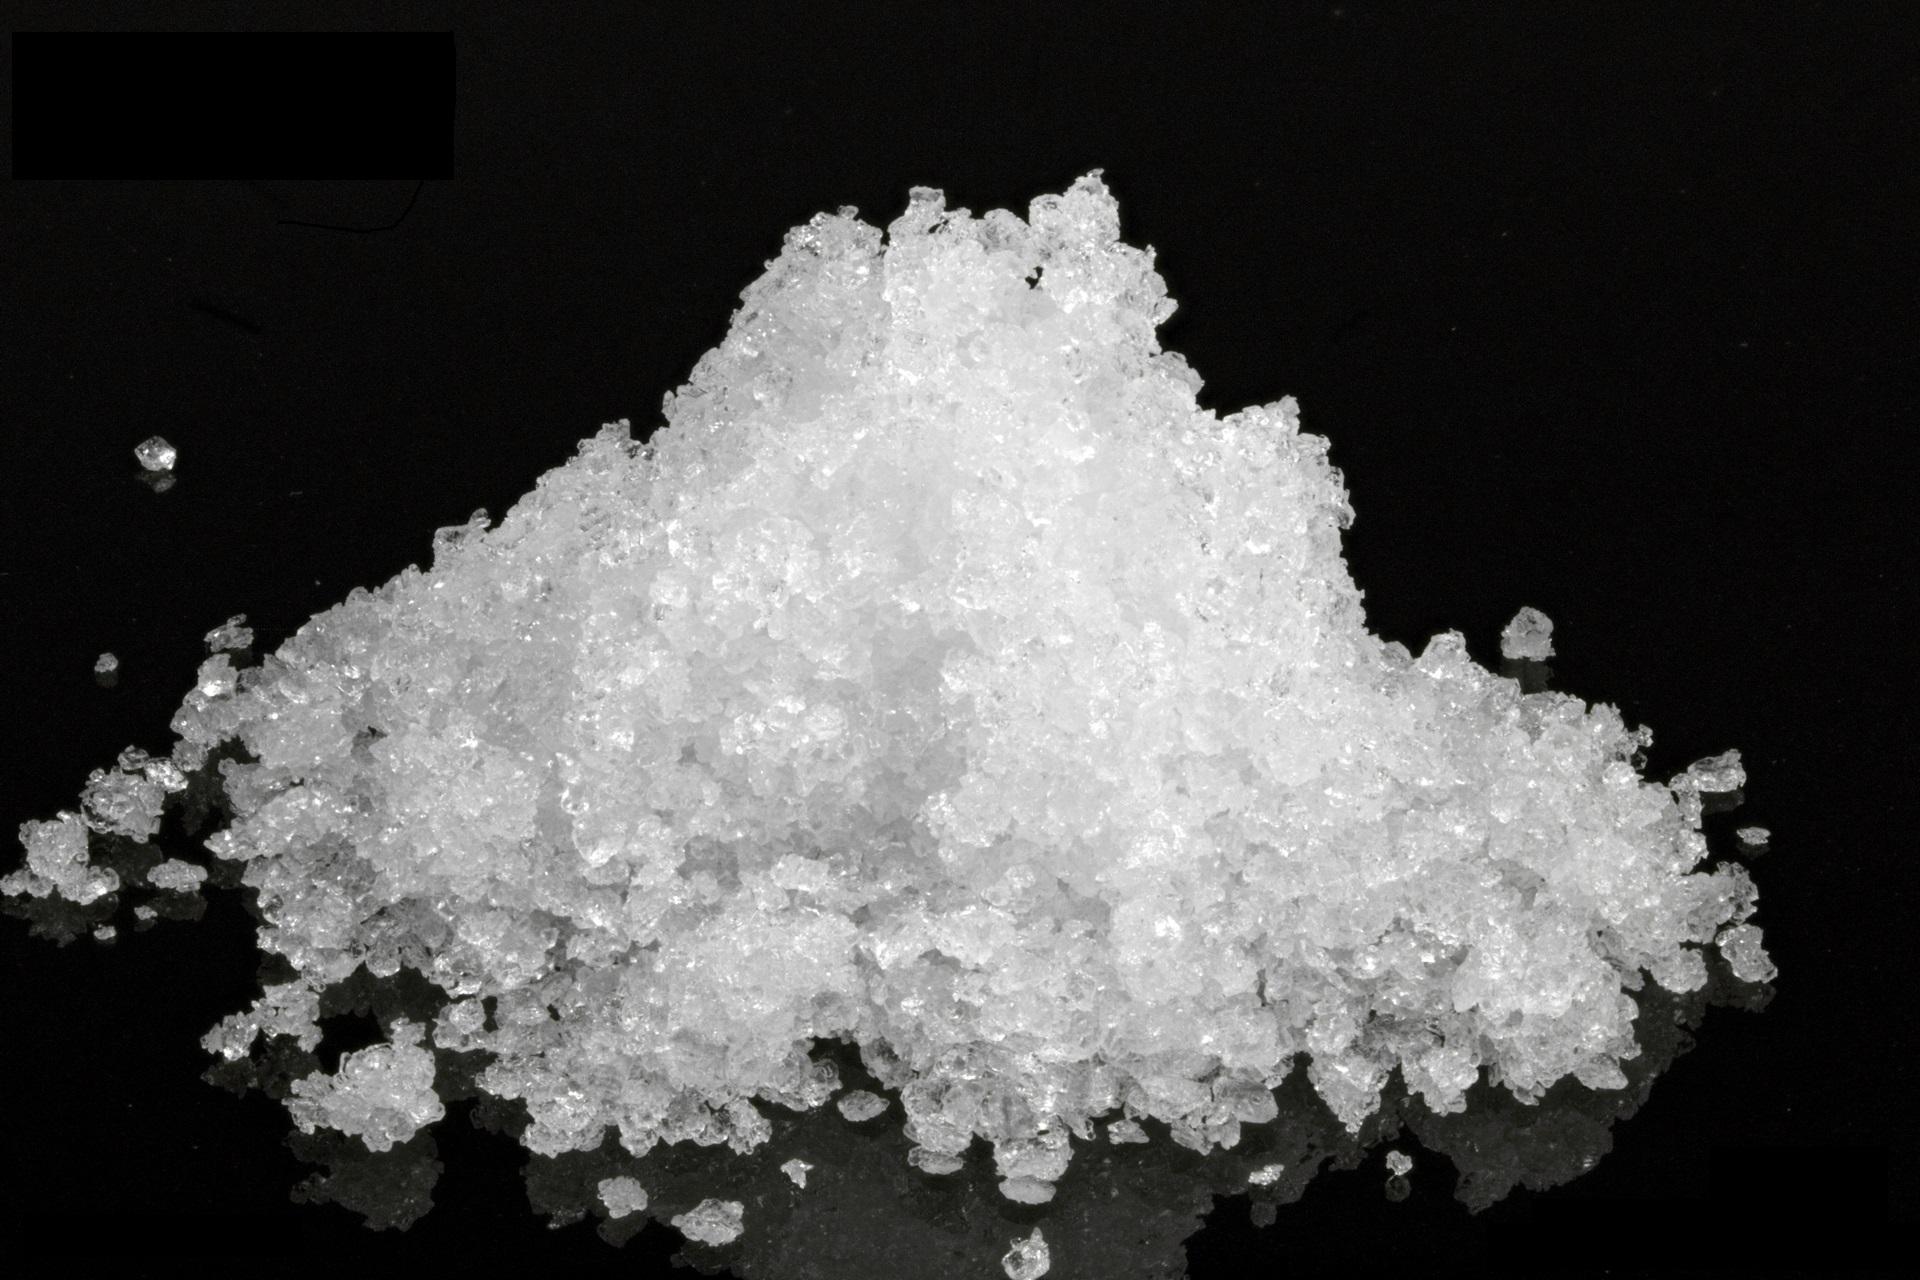 Горение гипофосфита натрия. Burning of sodium hypophosphite